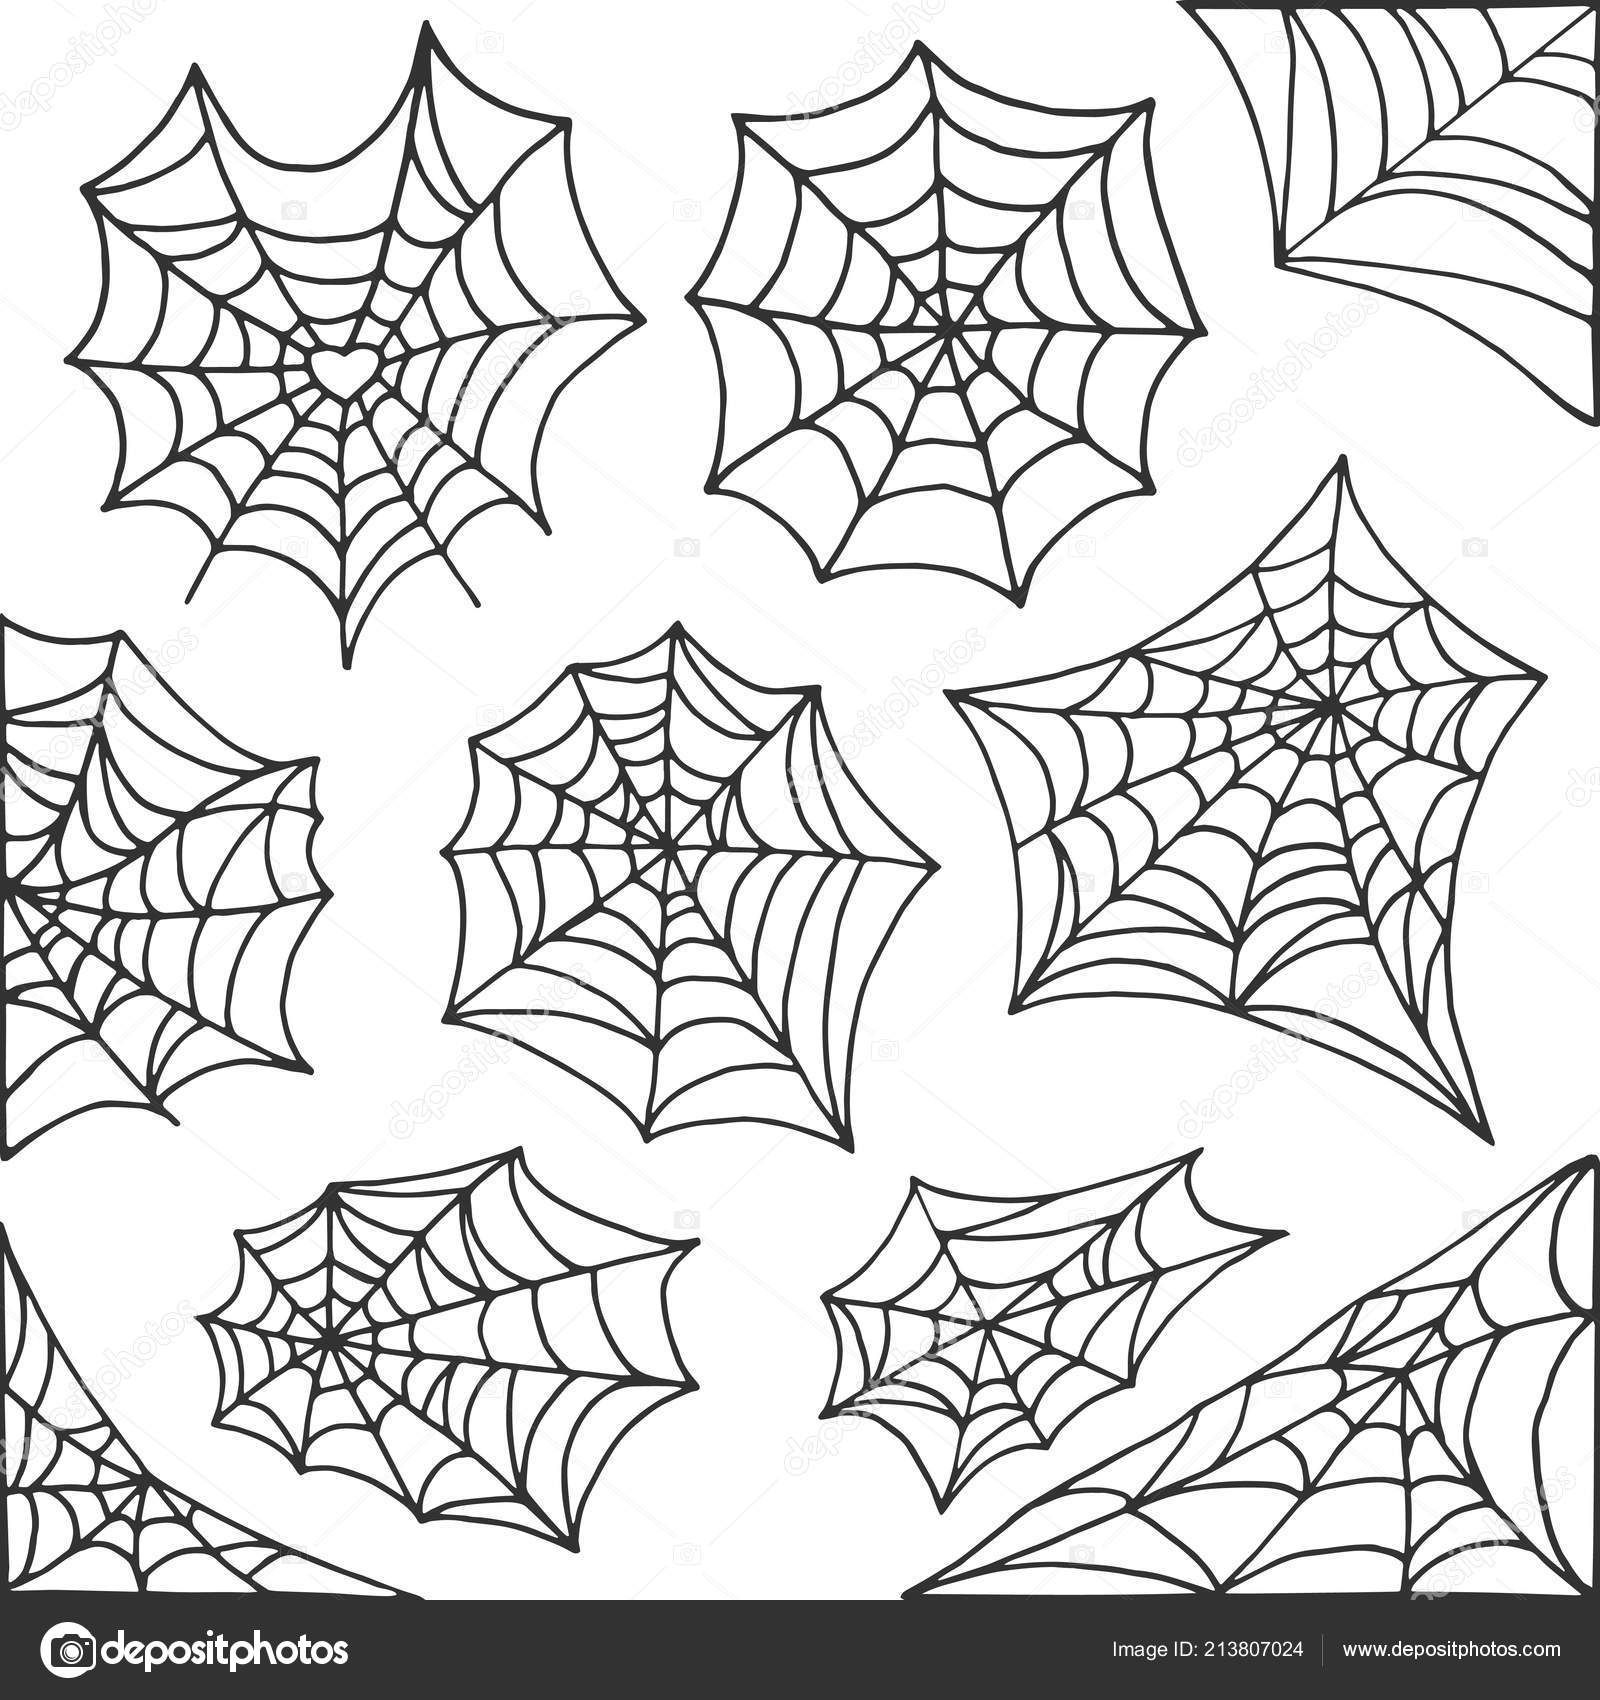 hand drawn spider web halloween symbol. cobweb decoration elements